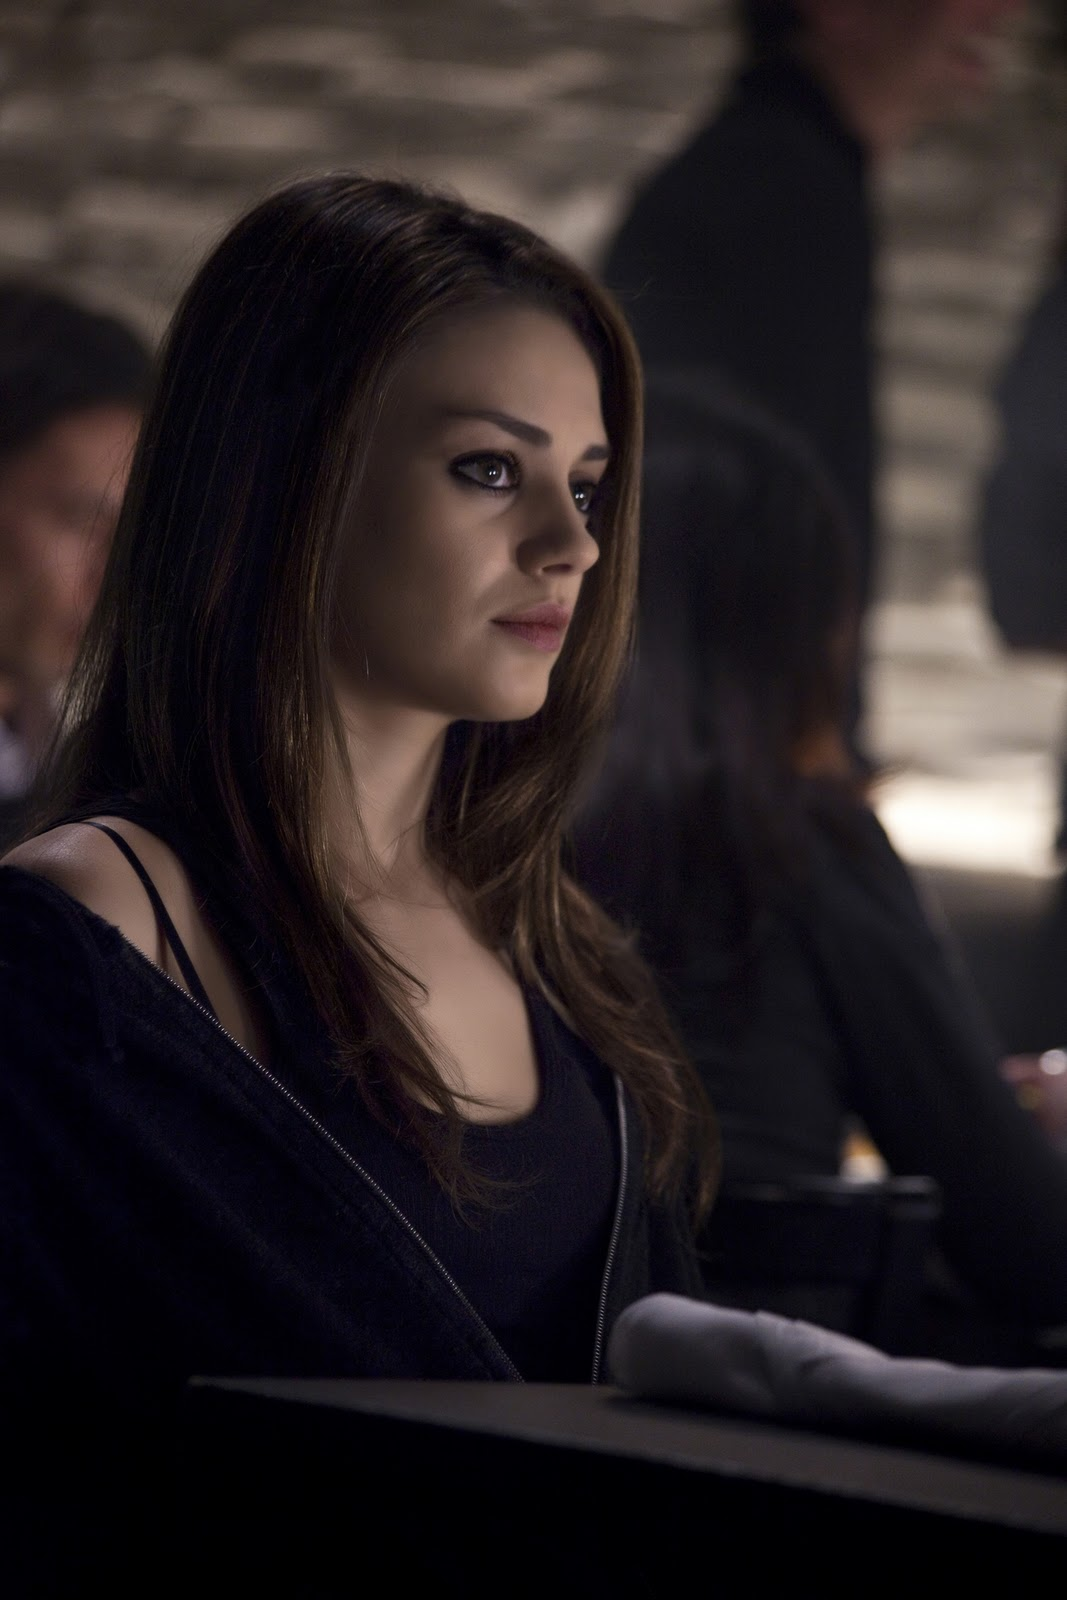 Mila Kunis awakens Natalie Portman's Virginal Role in ... Mila Kunis Movies